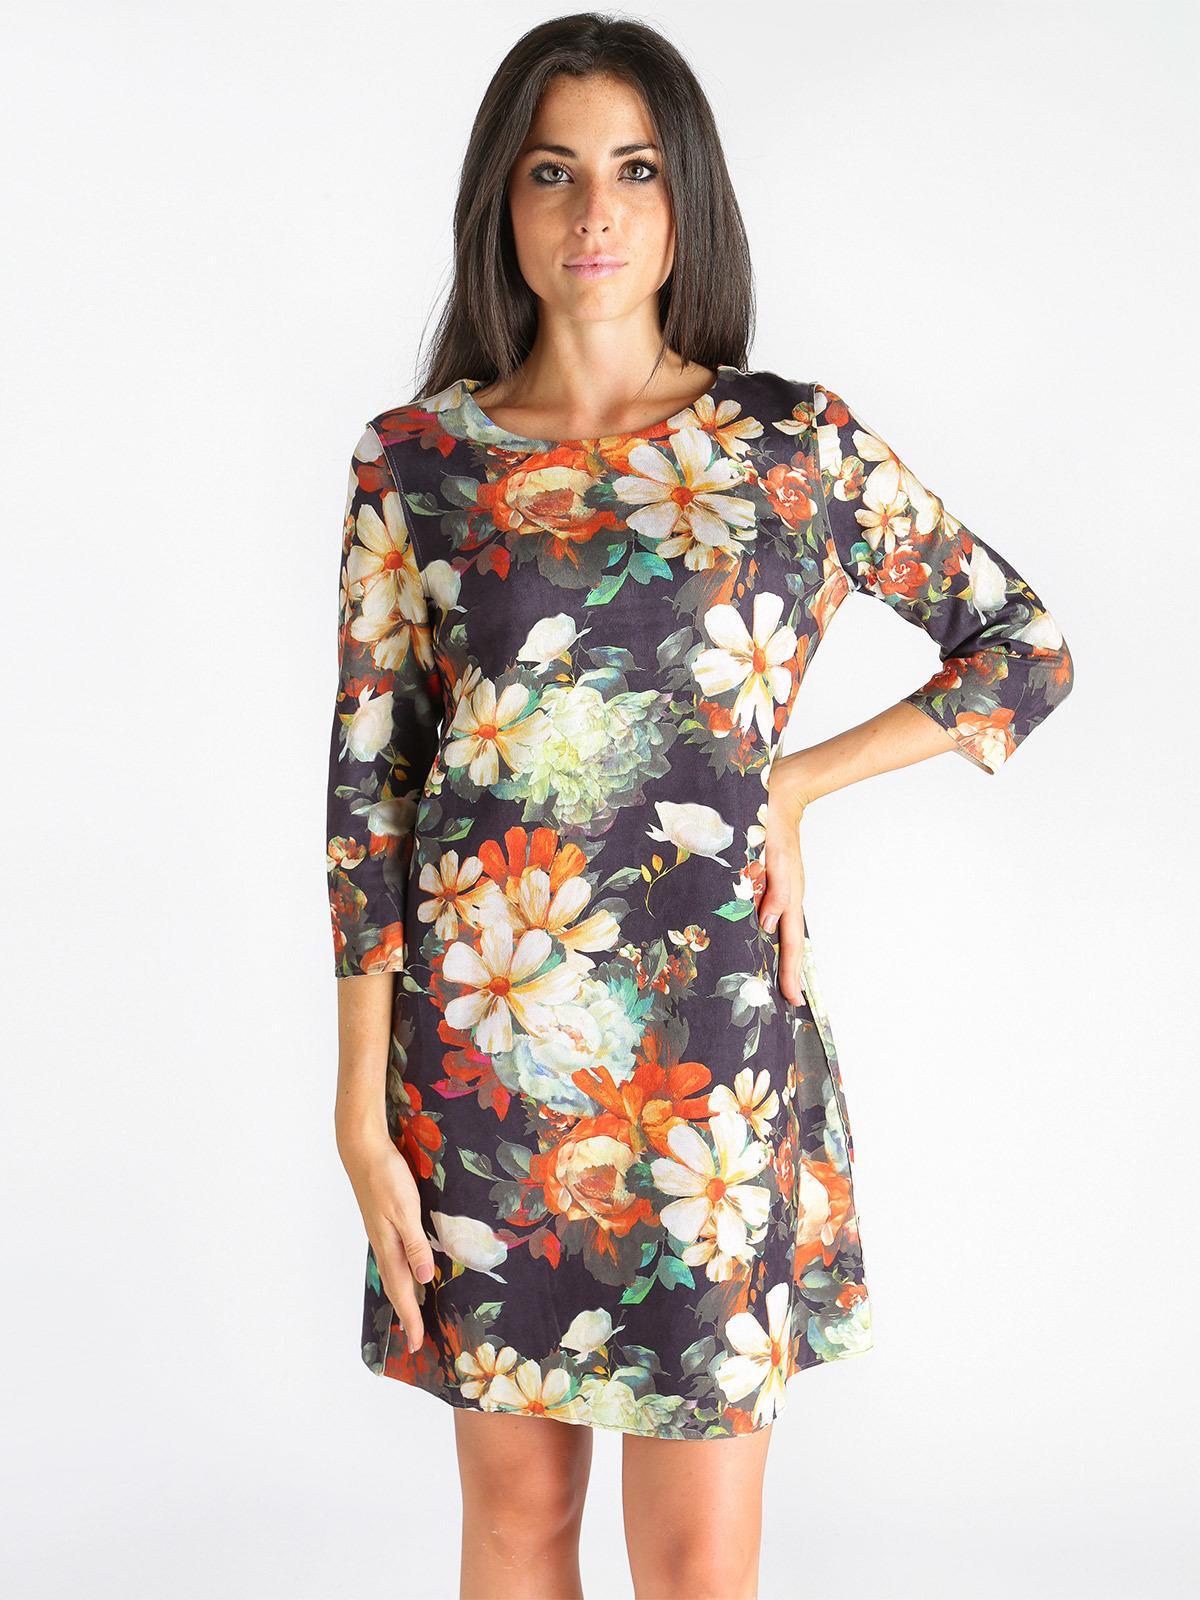 buy online a3154 9f7aa Abito con fiori solada   MecShopping